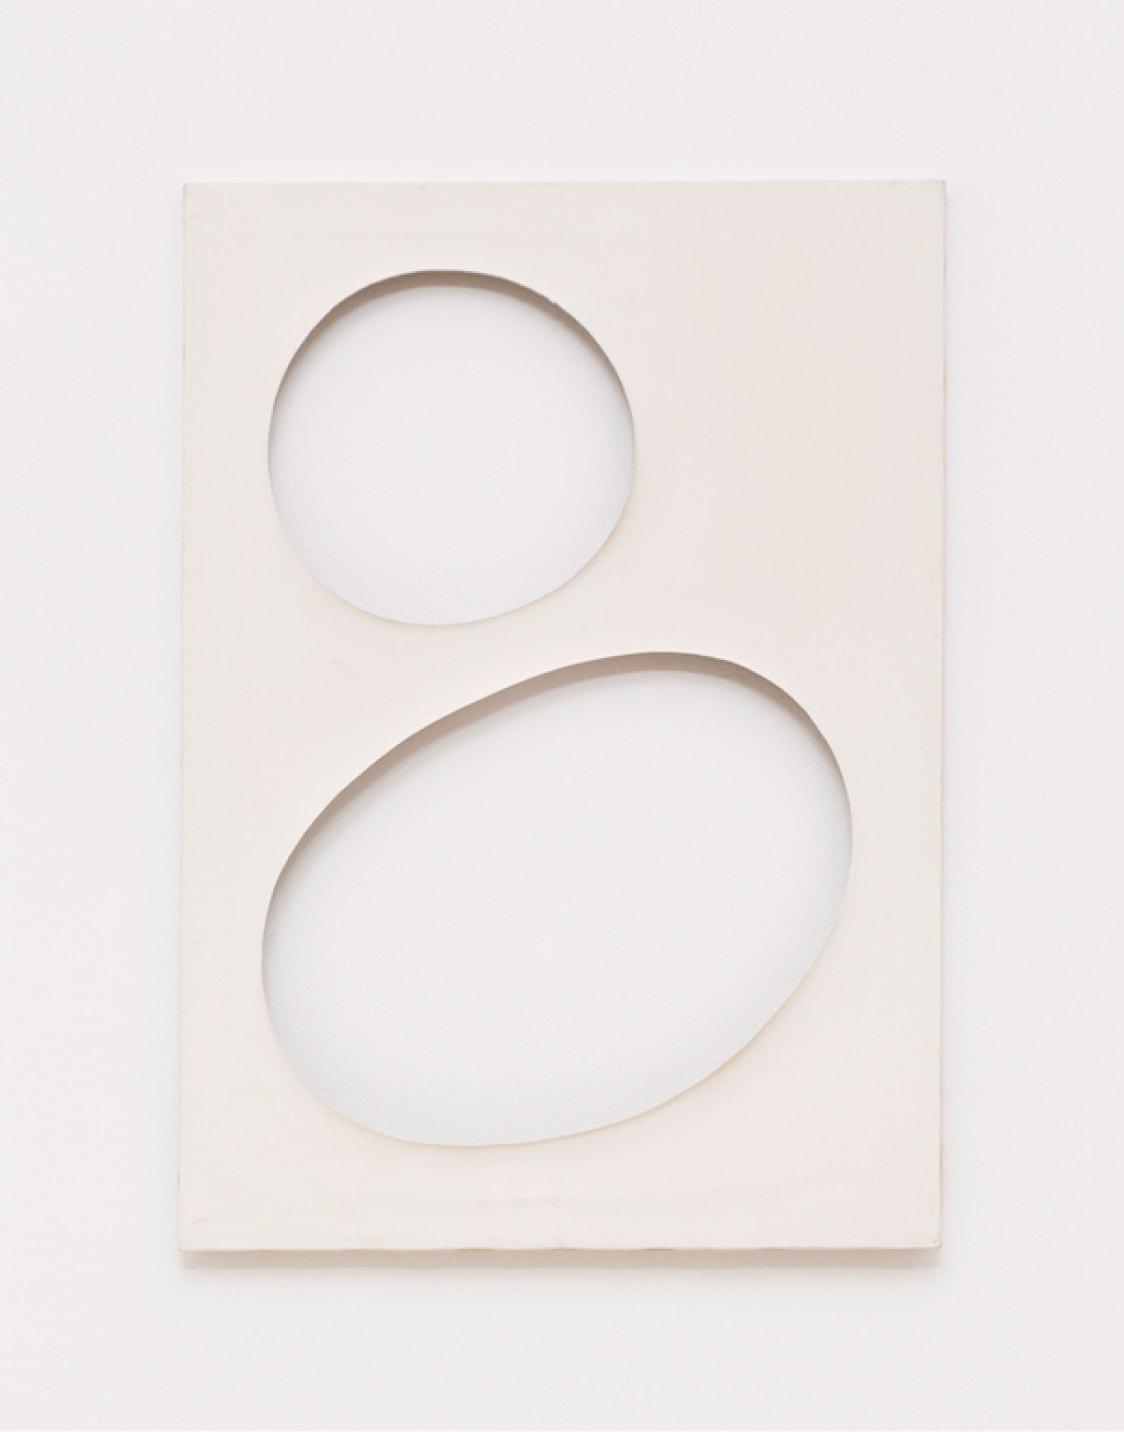 Dadamaino,<em>untitled, fromVolumiseries,</em>1959,water-based ink on canvas, 70 ×50 cm - Mendes Wood DM